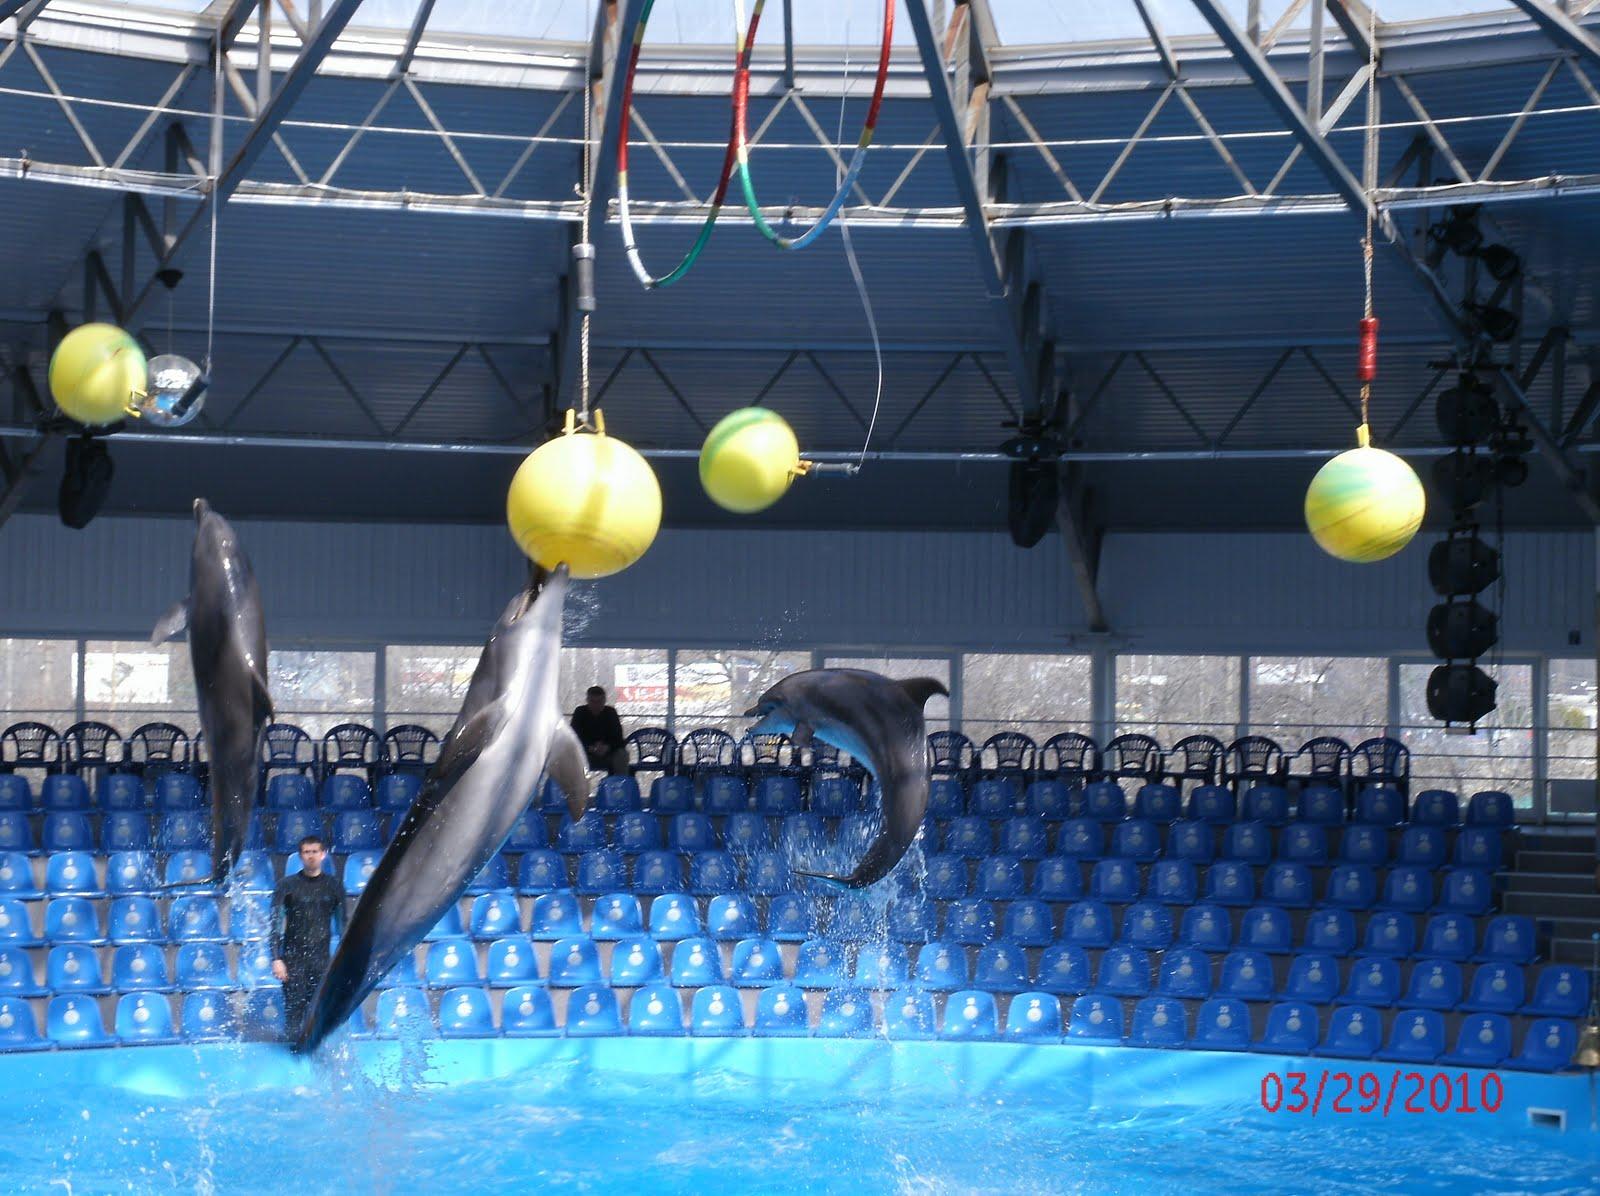 http://2.bp.blogspot.com/_ook4N5MwmdI/S7ICSktbjjI/AAAAAAAAAII/QiK6AS_vMNM/s1600/Dolphin+Show+(2).JPG